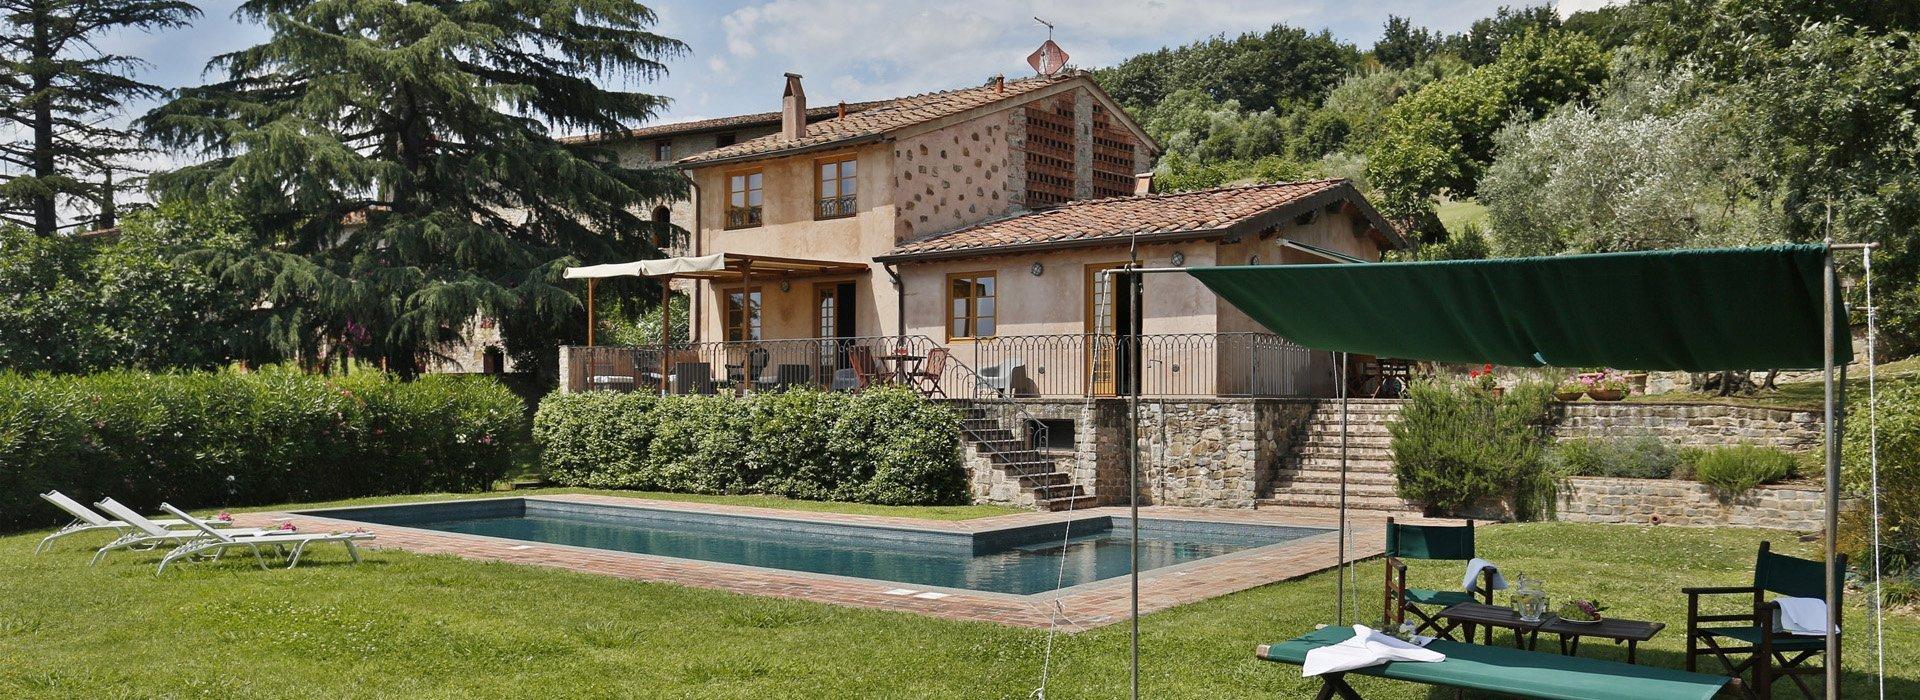 holiday villas in lucca